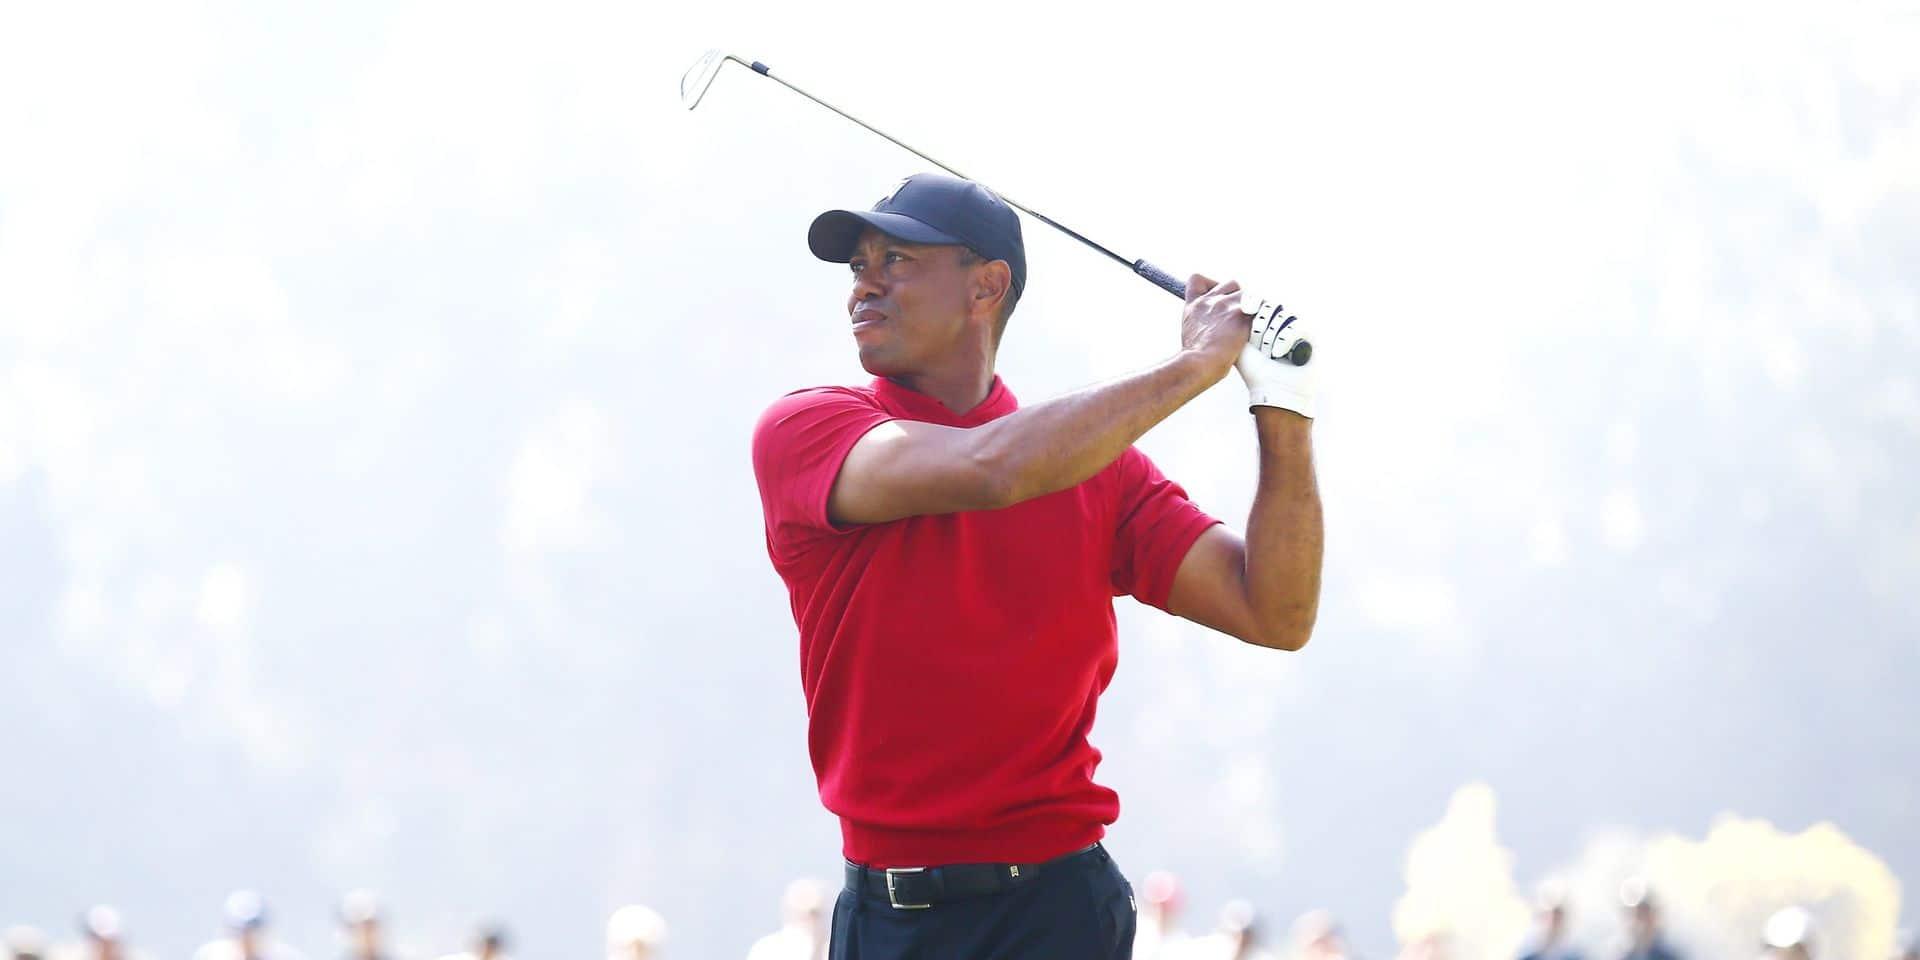 Tiger Woodssort du silence face au coronavirus